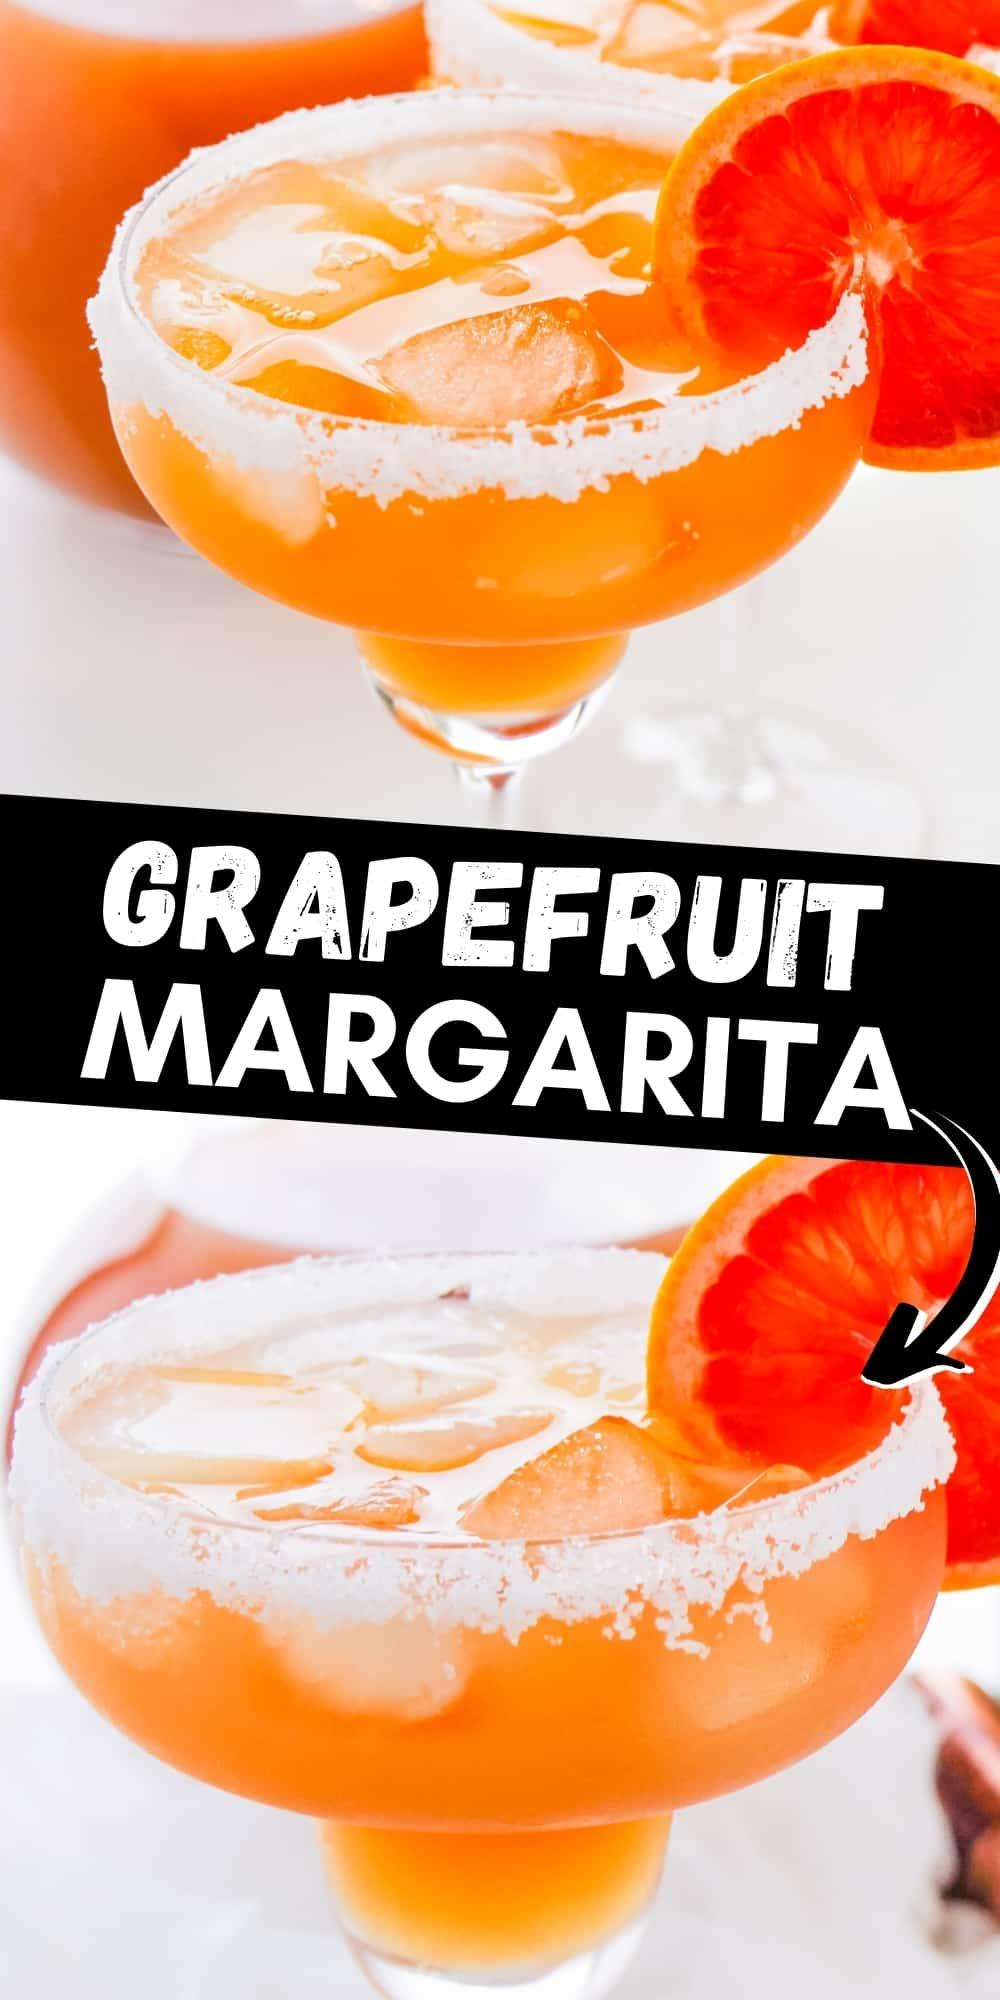 Grapefruit Margarita Pinterest Image